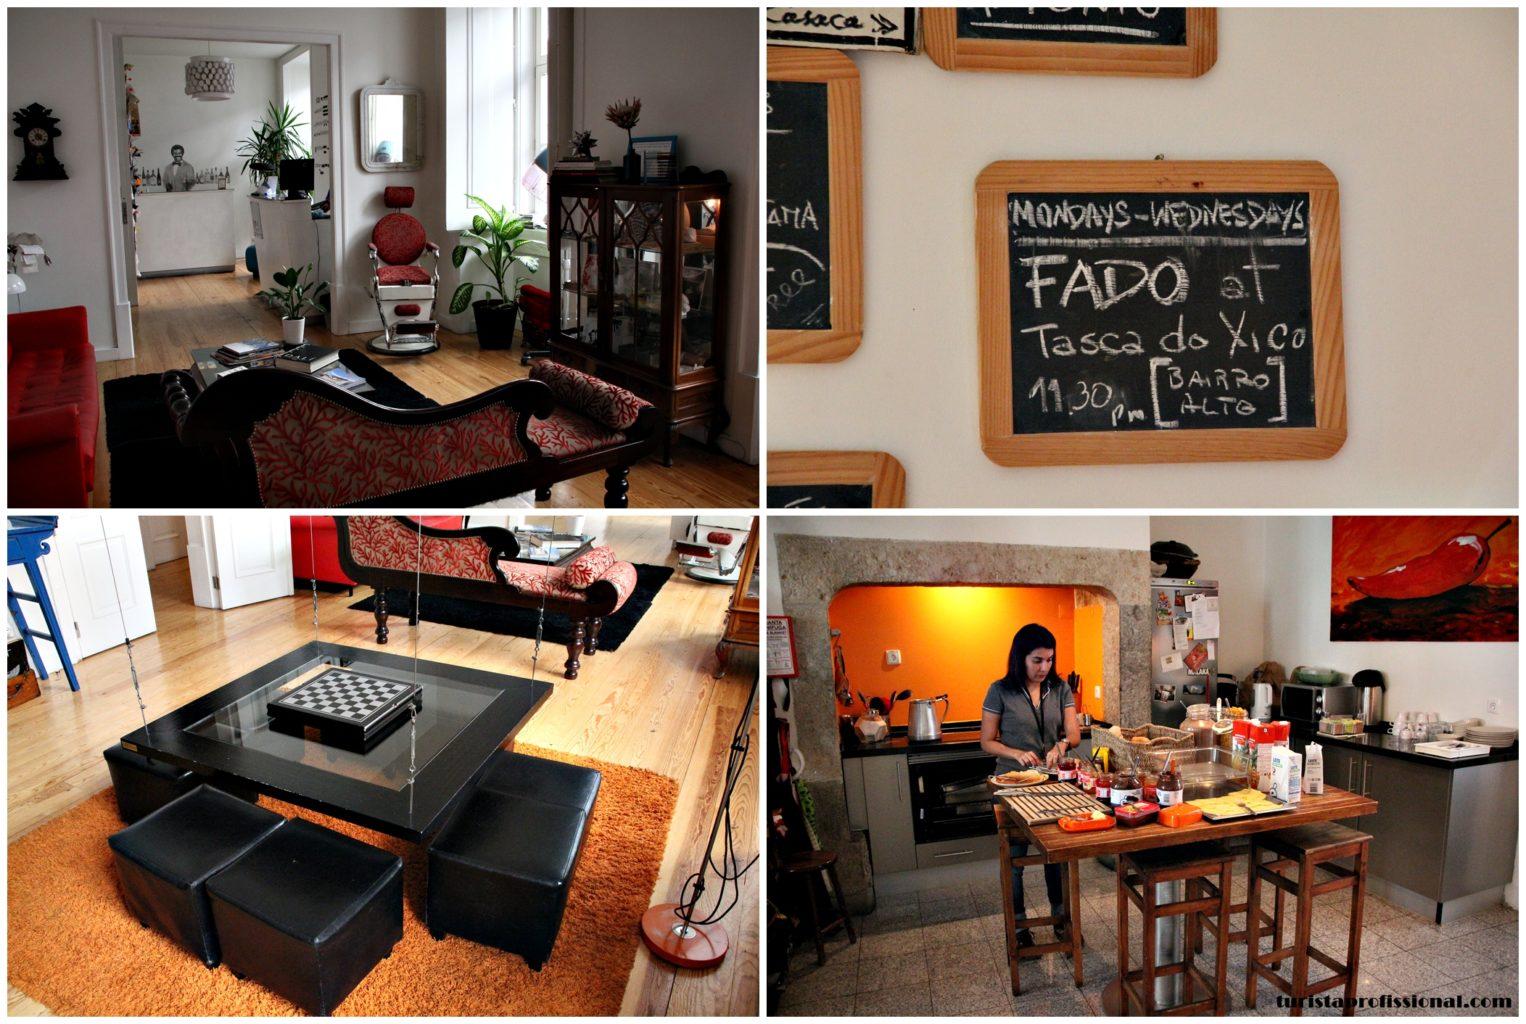 1 sala1 - Hospedagem em Lisboa: Living Lounge